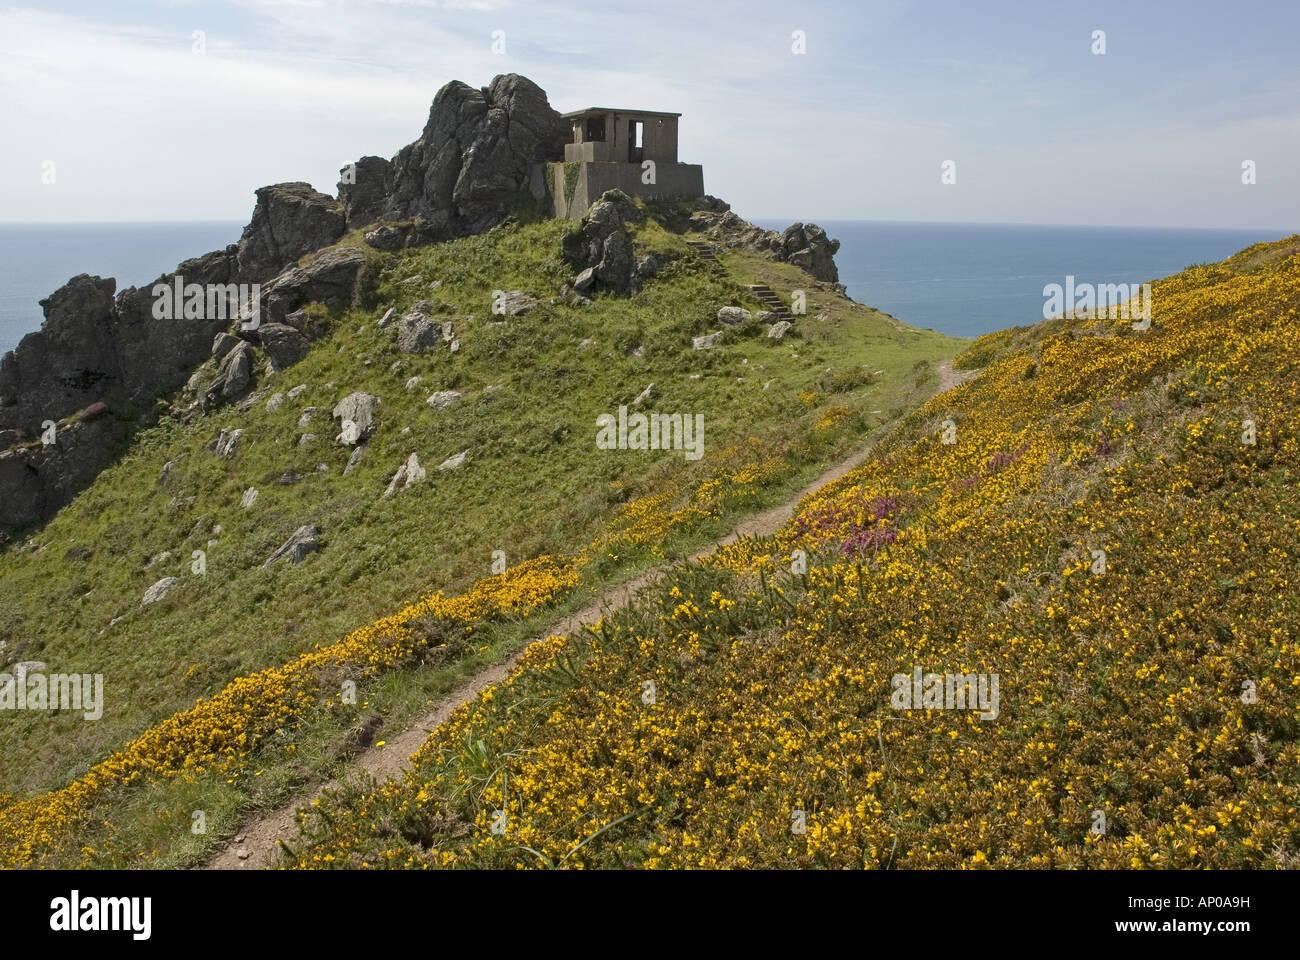 South west coast path at Bolt Head, south Devon Stock Photo